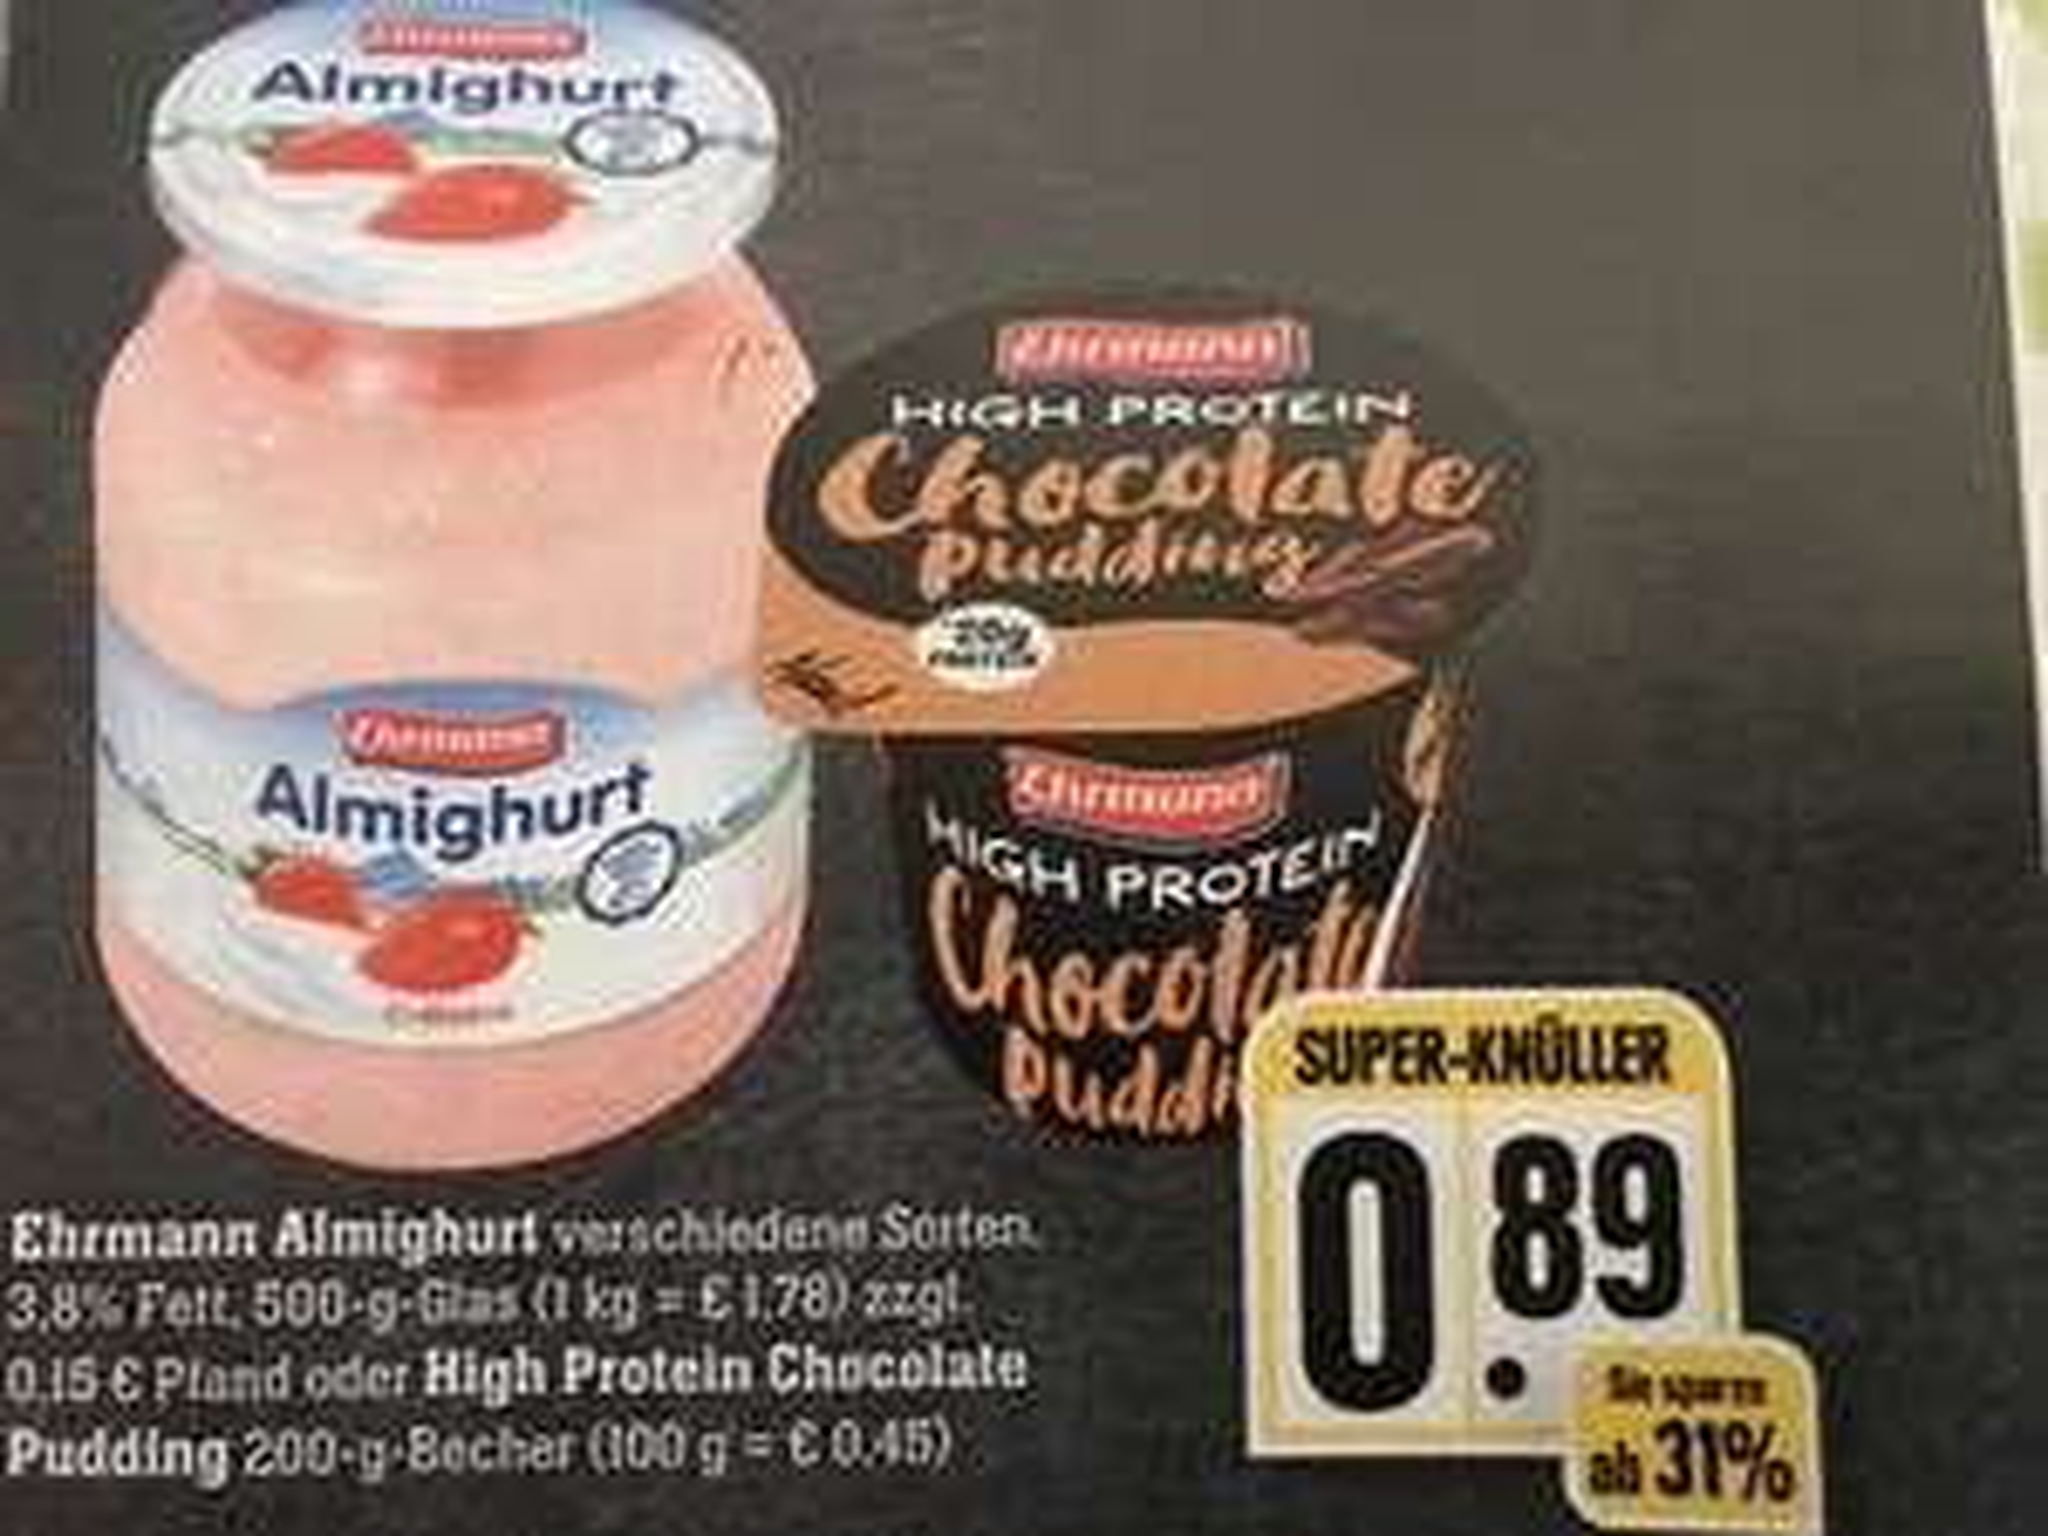 [Scondoo] Ehrmann High Protein Pudding bei EDEKA